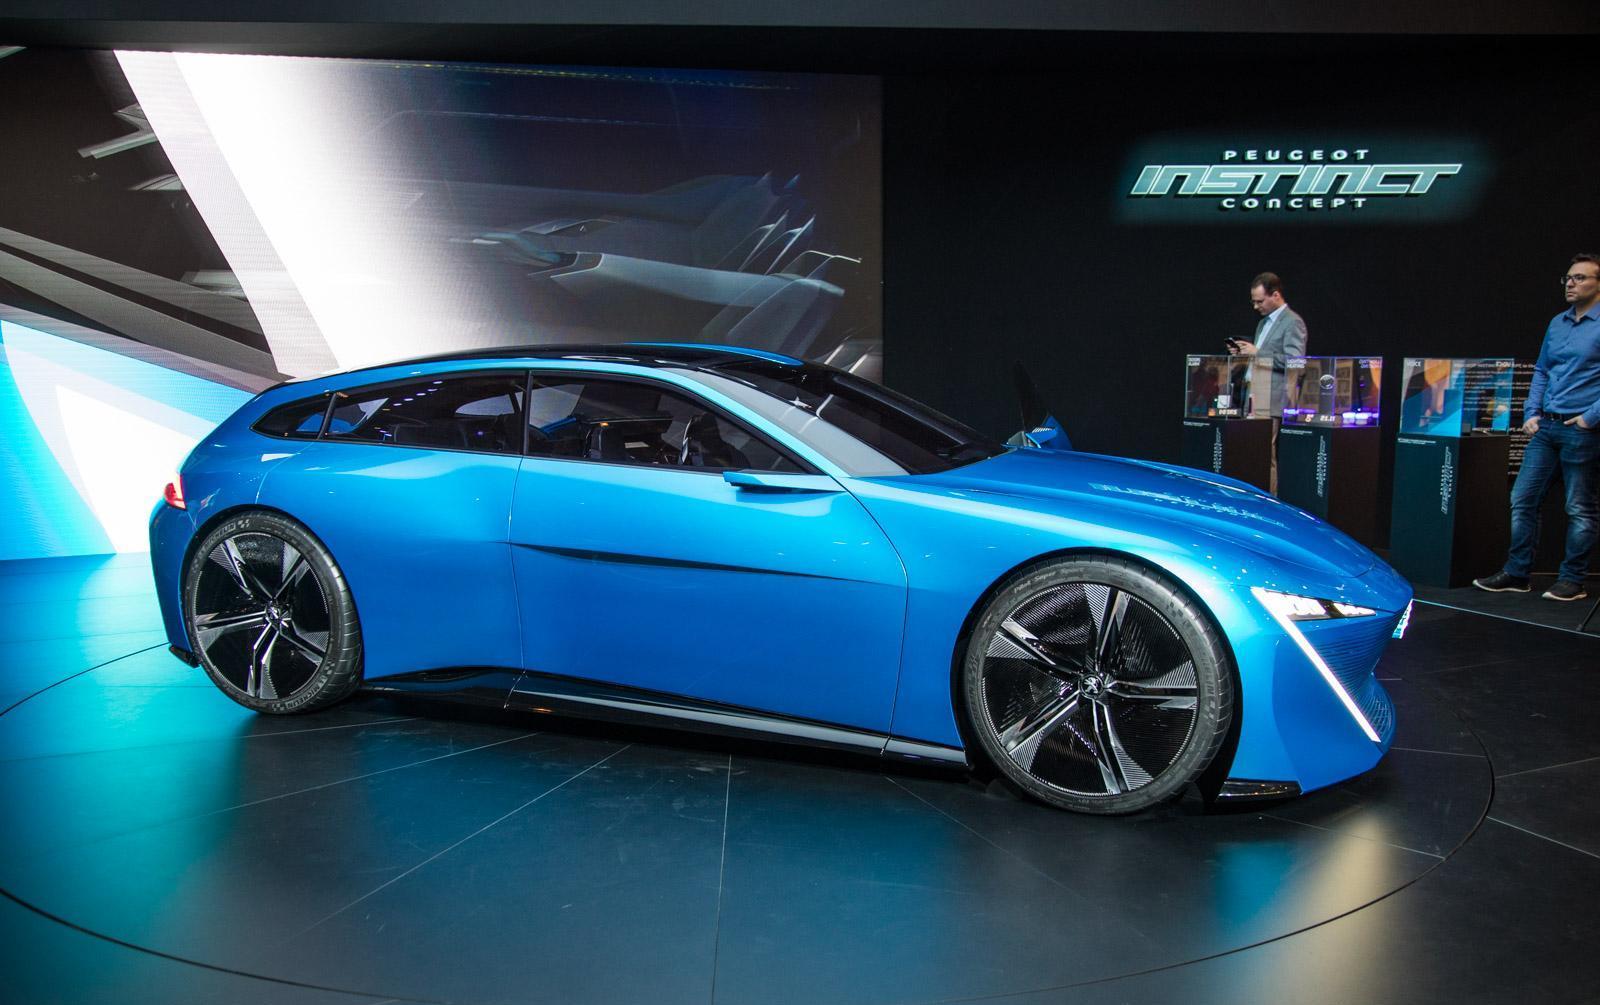 Peugeot-instinct-concept-022